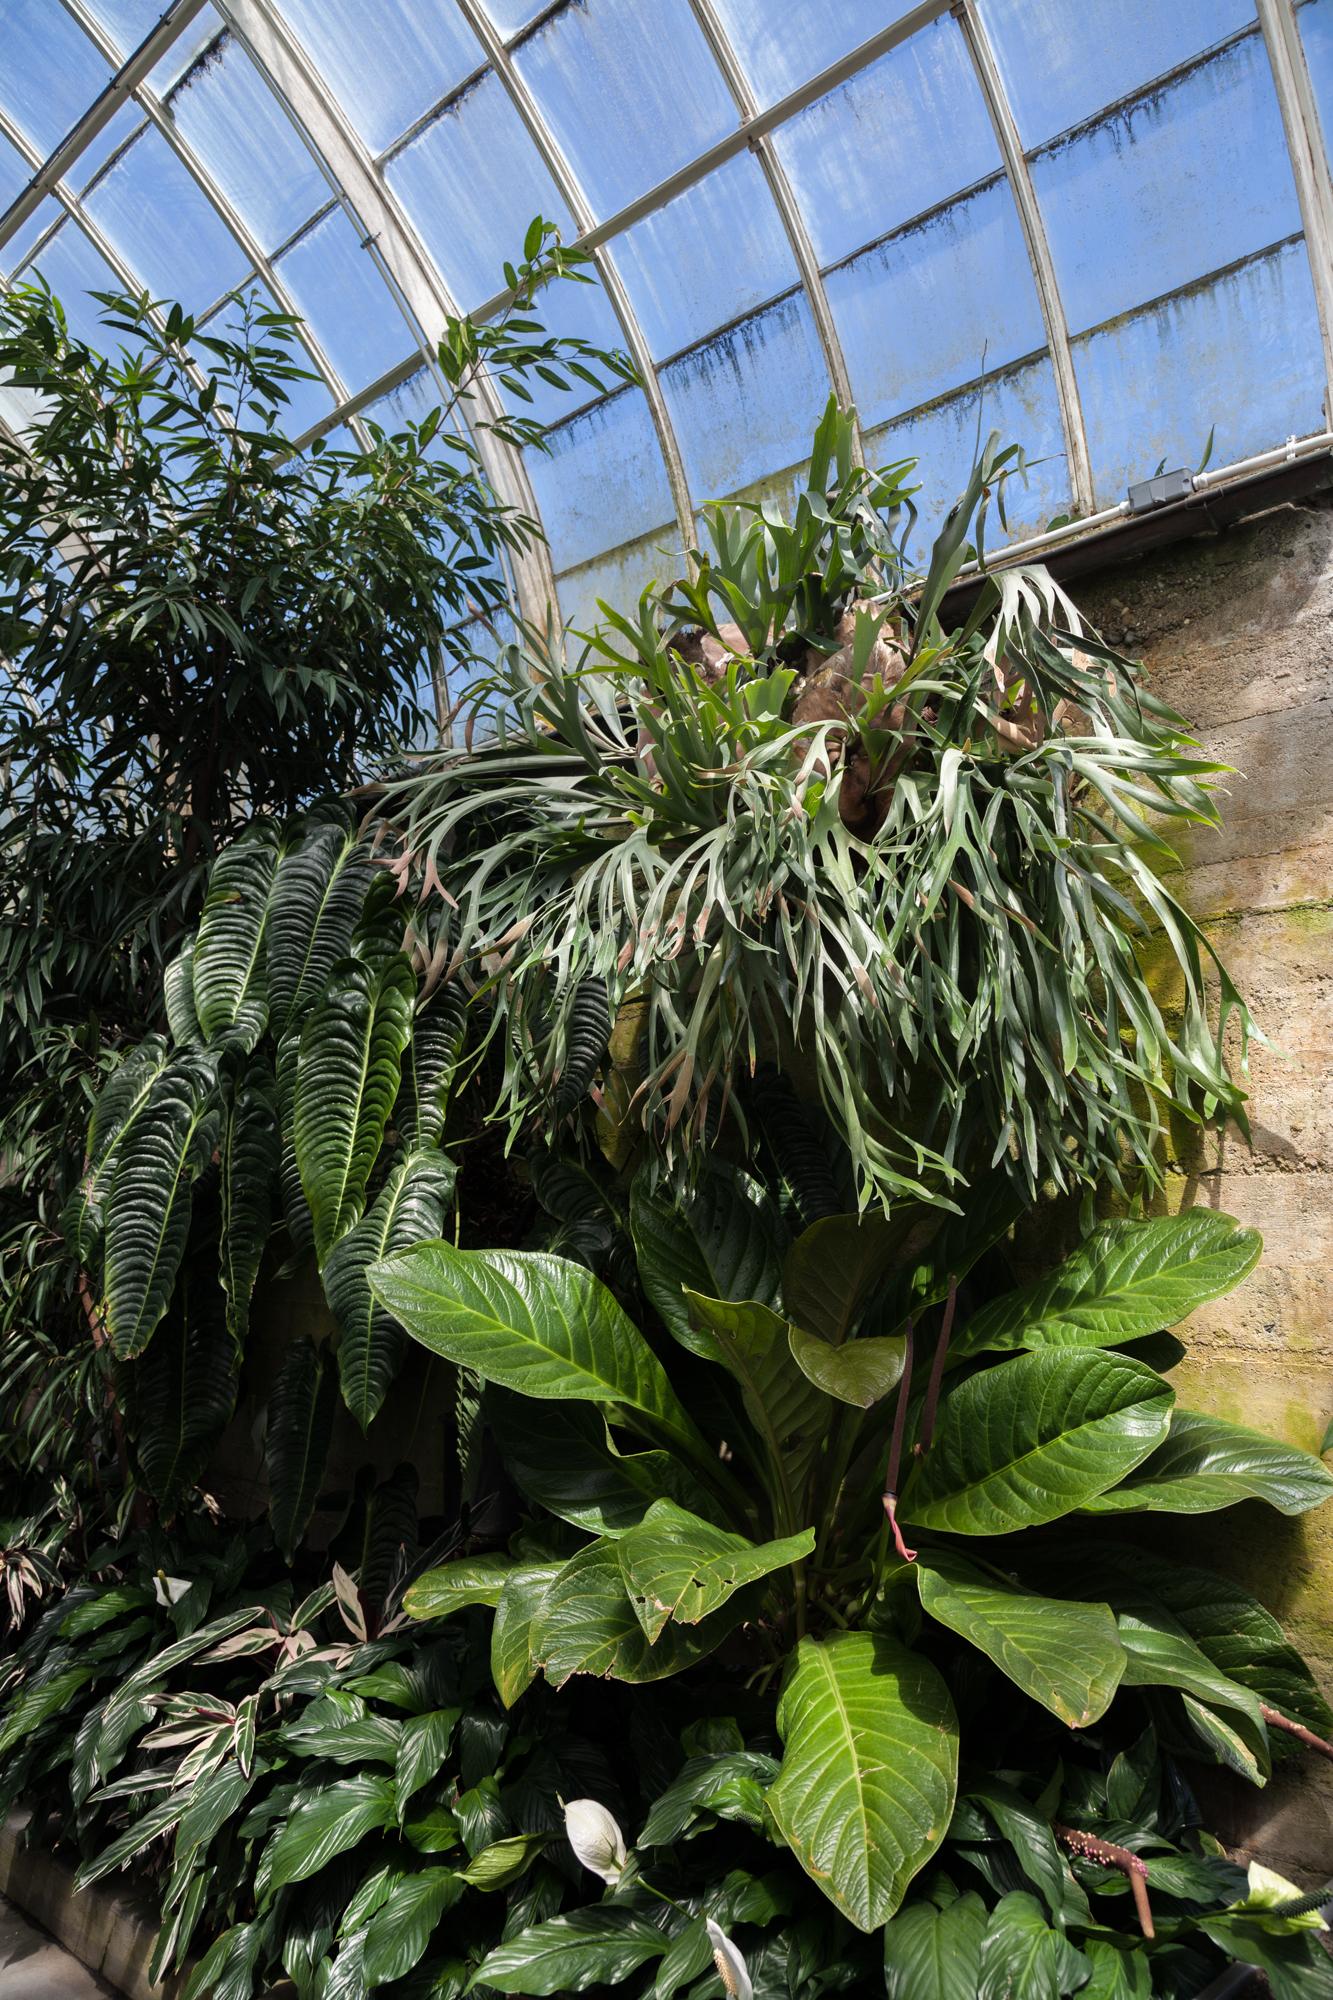 Volunteer-Park-Conservatory-Anthurium-vetchii.jpg